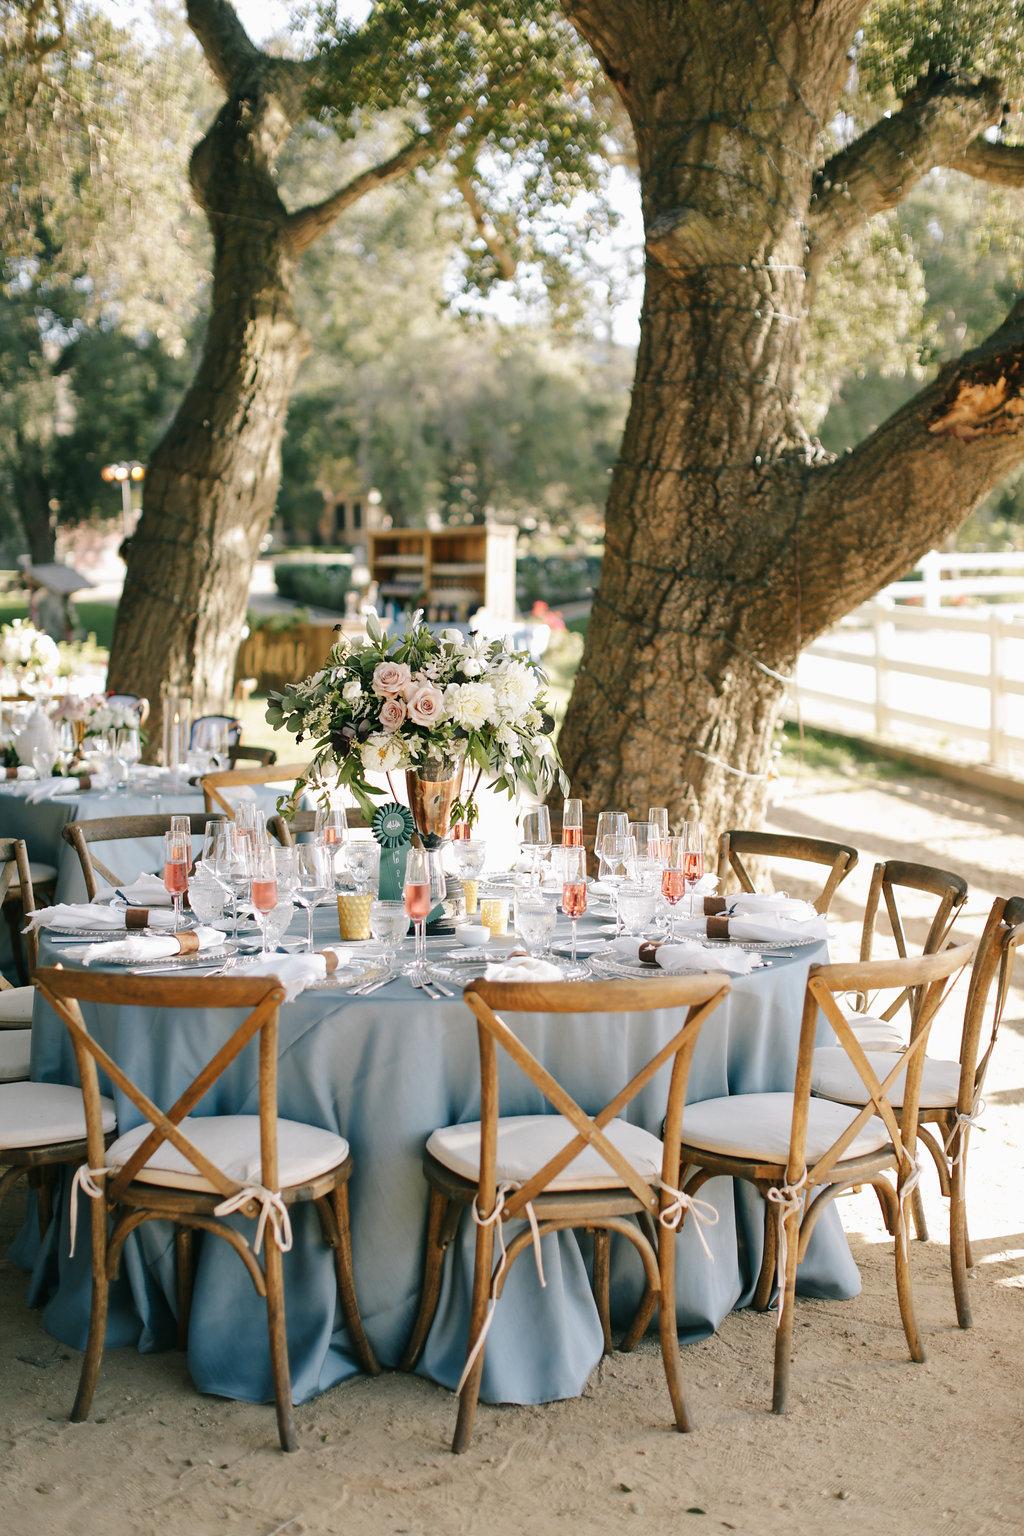 LVL Weddings and Events Brandon Kidd Equestrian Wedding (154).jpg